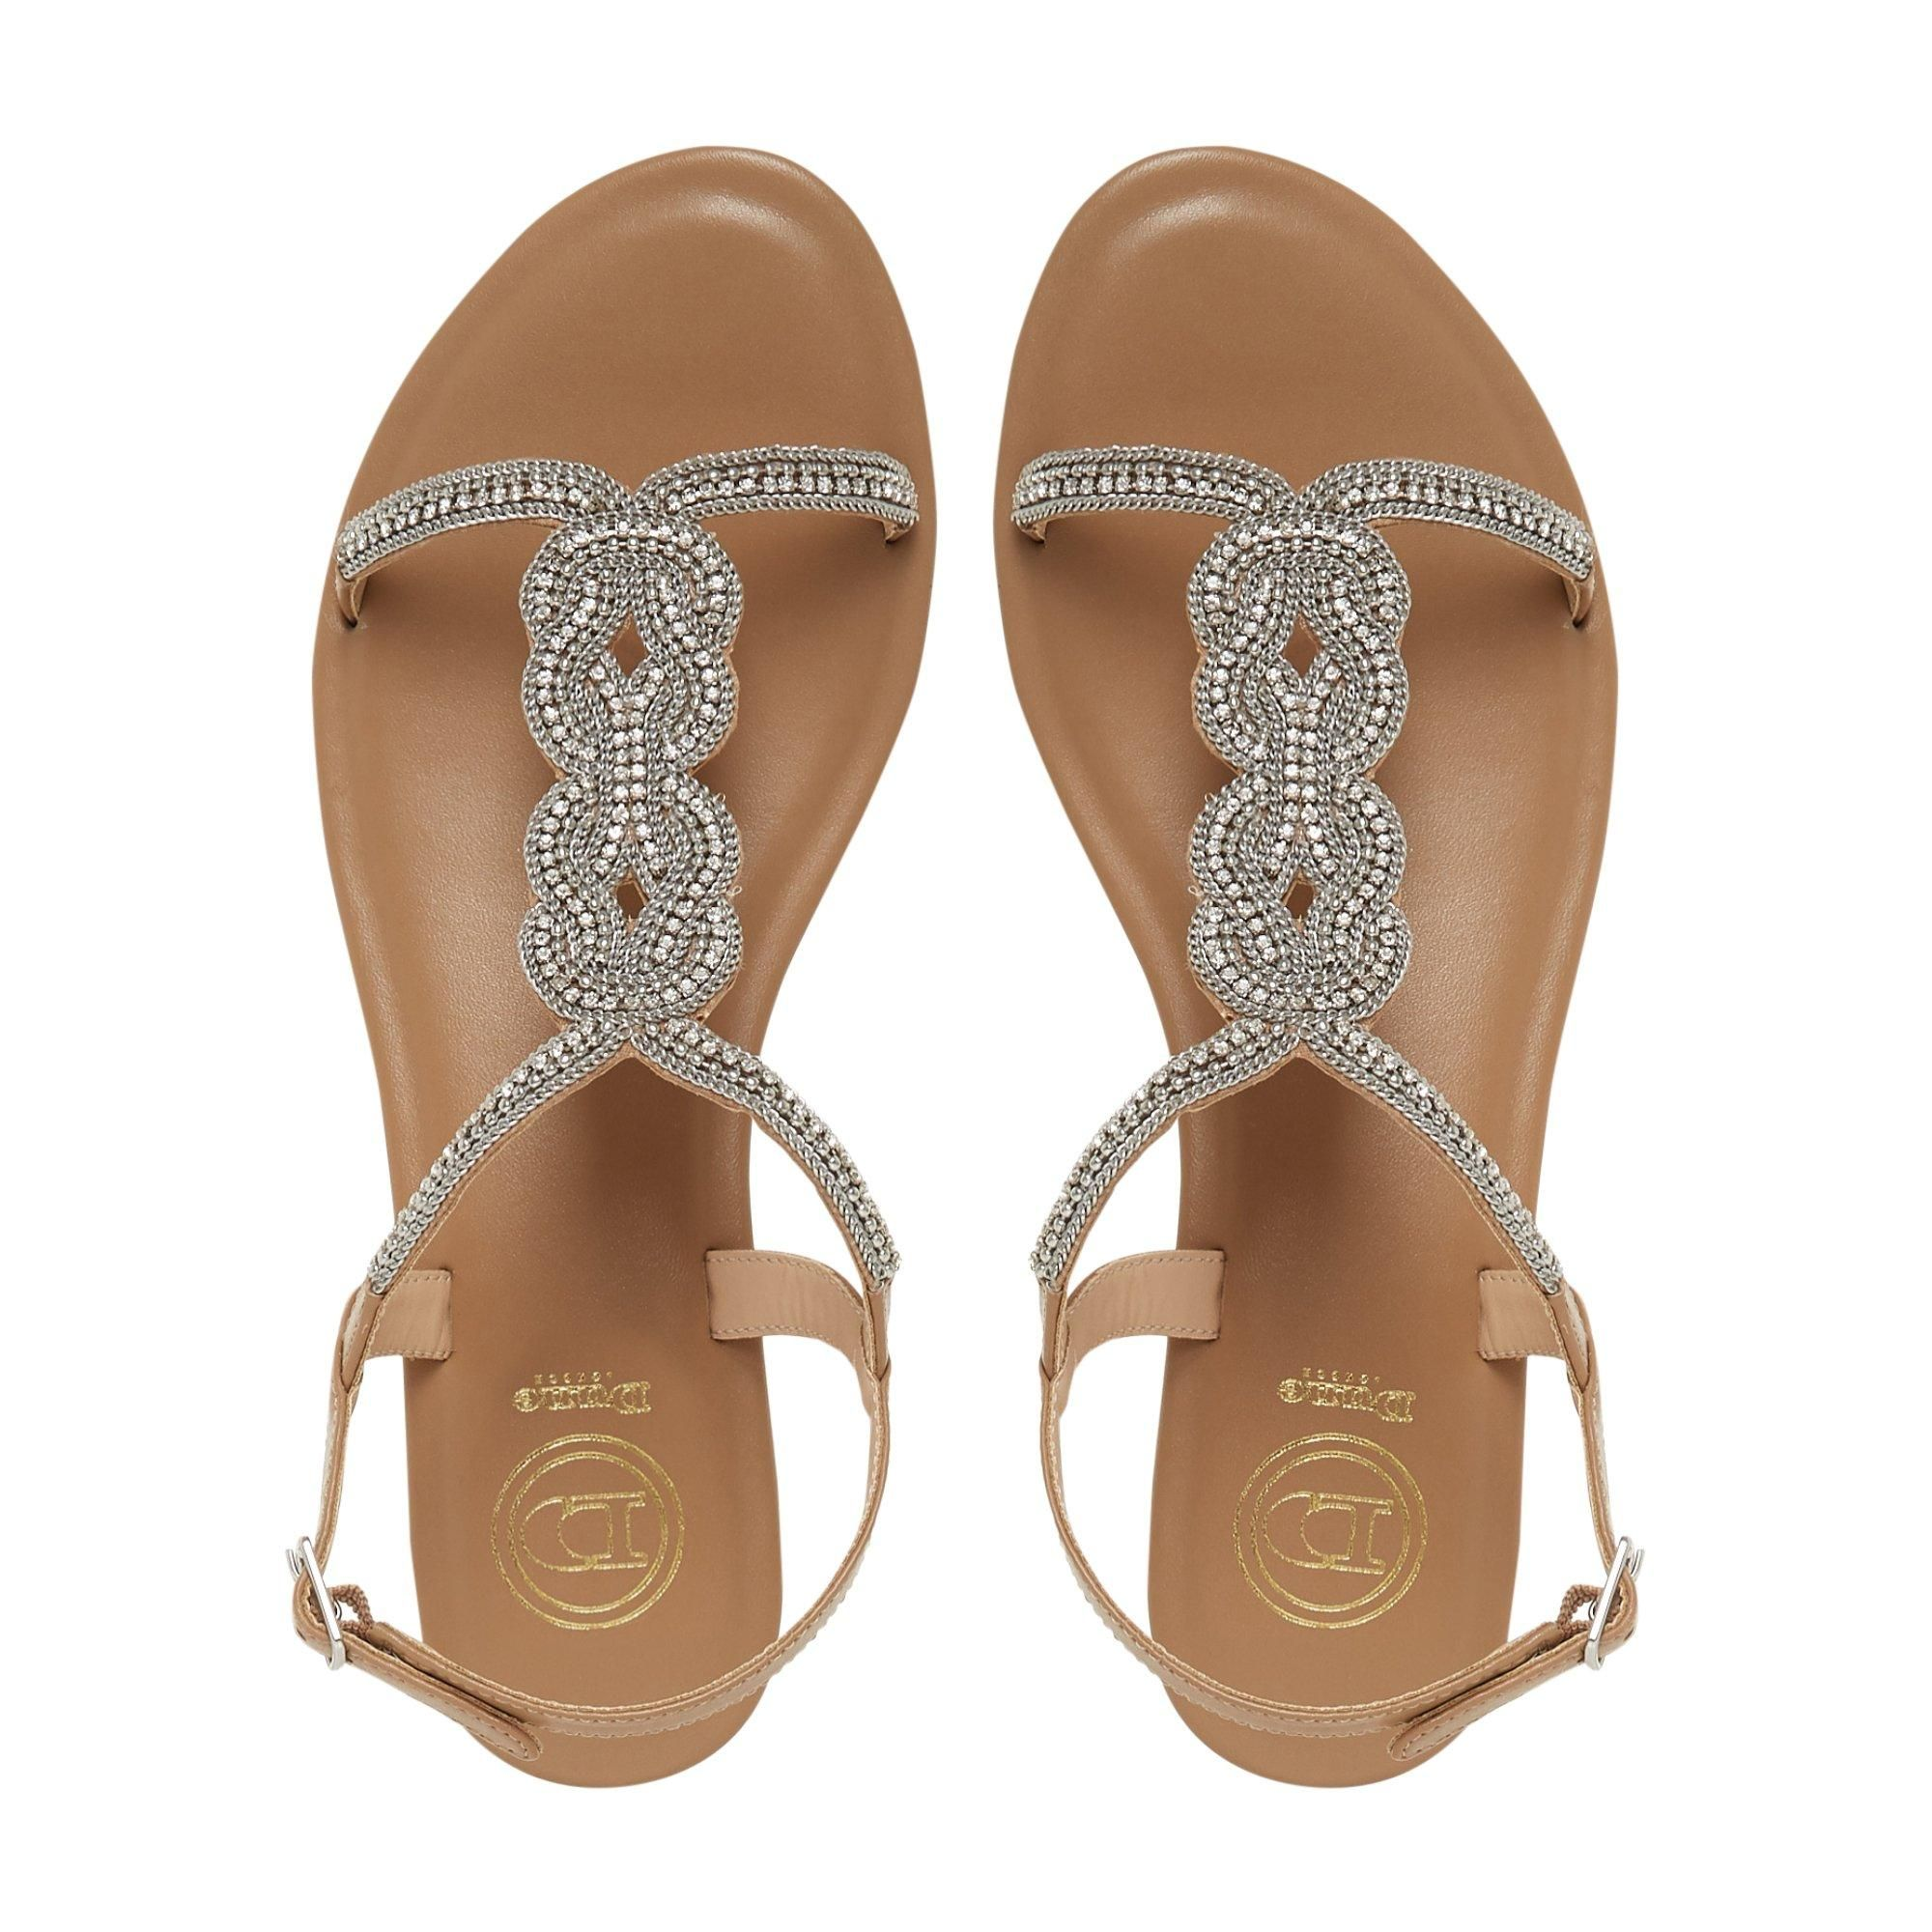 Dune Ladies NETTYS Embellished T-Bar Sandals